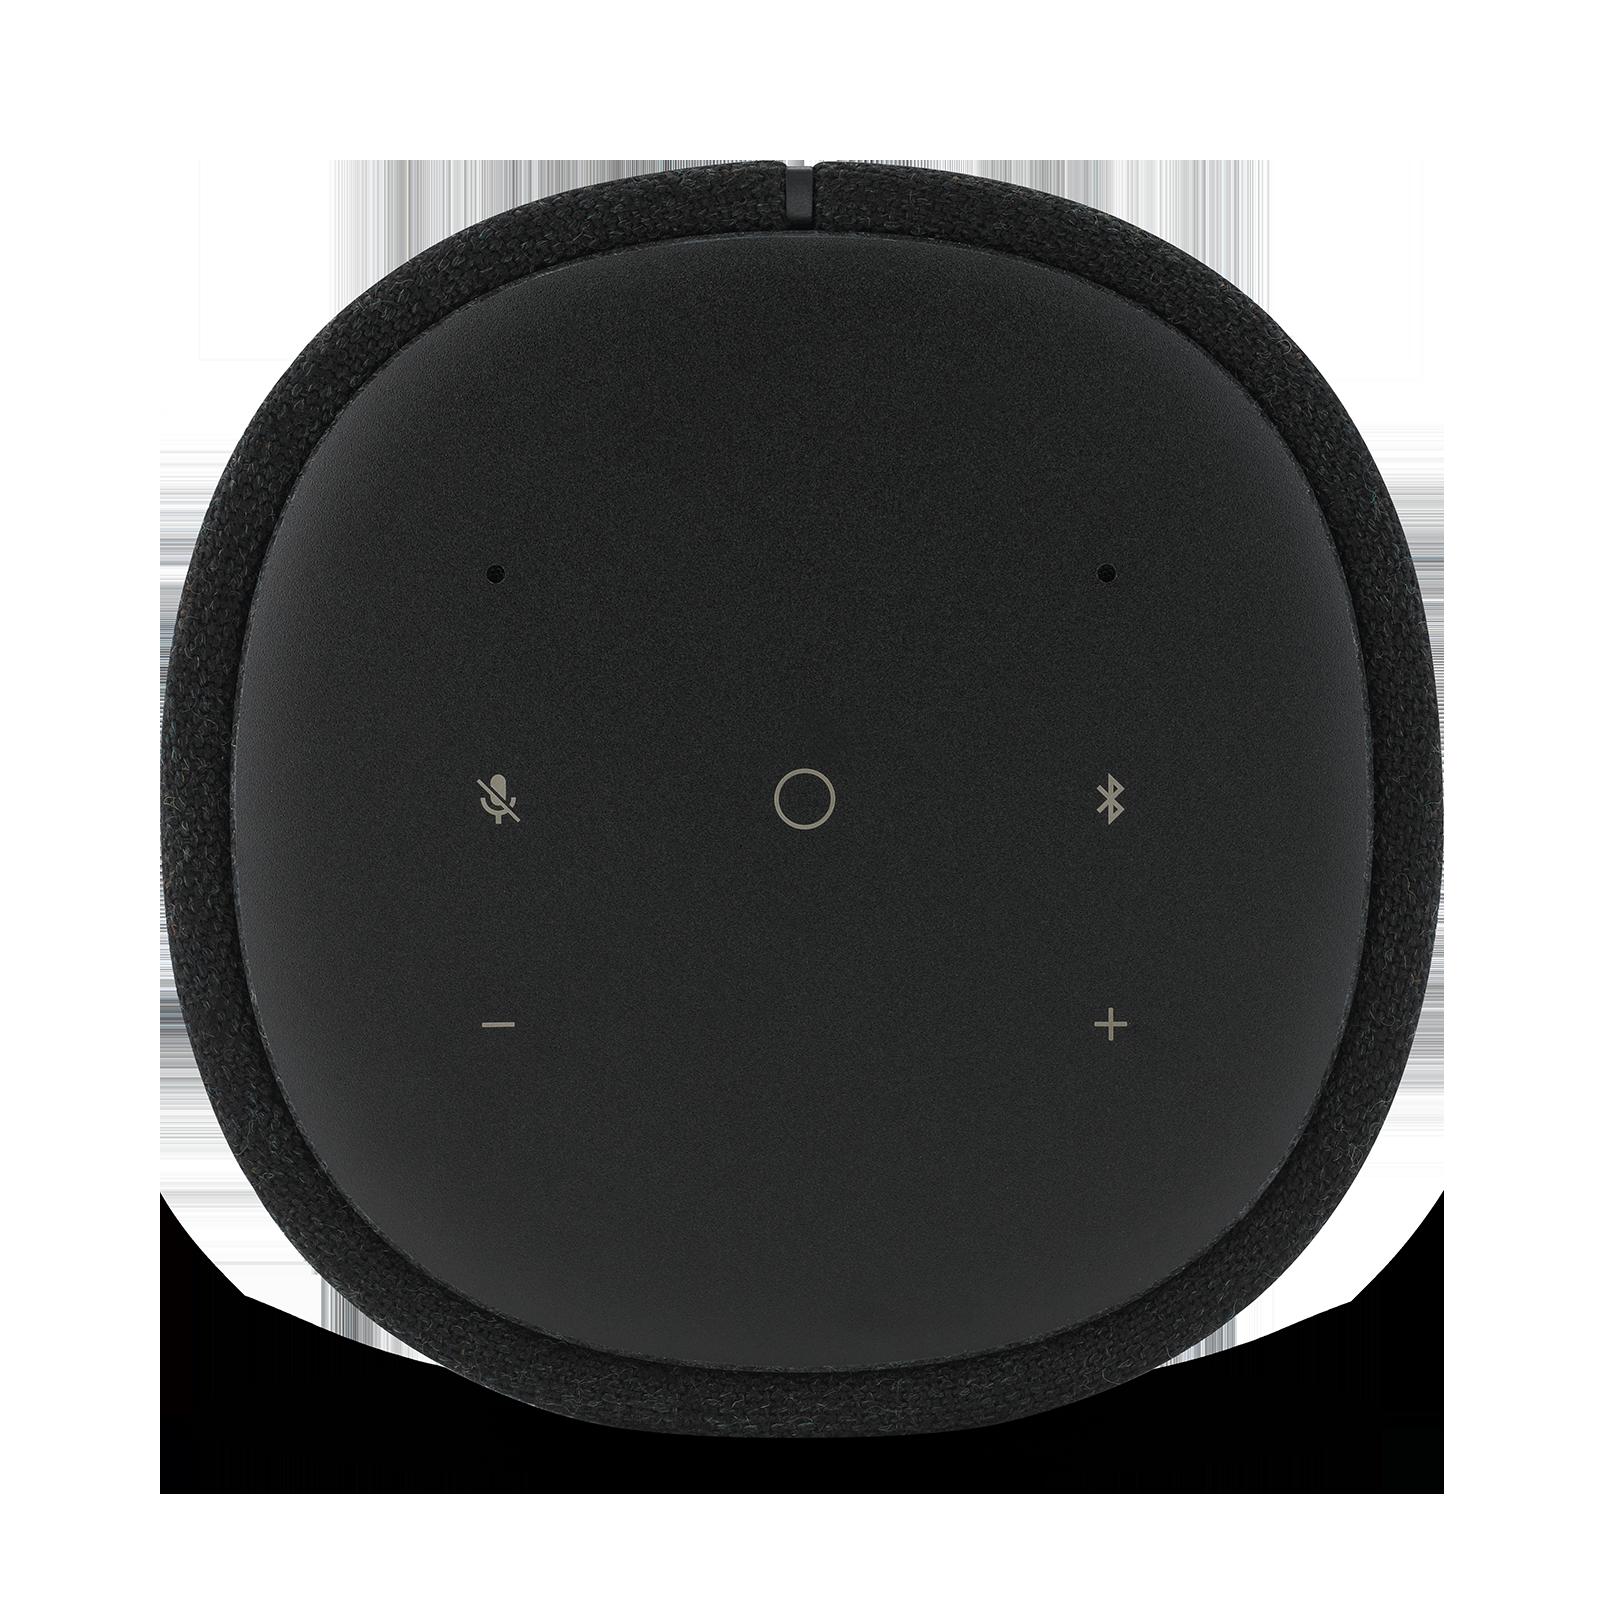 Harman Kardon Citation ONE DUO - Black - Compact, smart and amazing sound - Detailshot 3